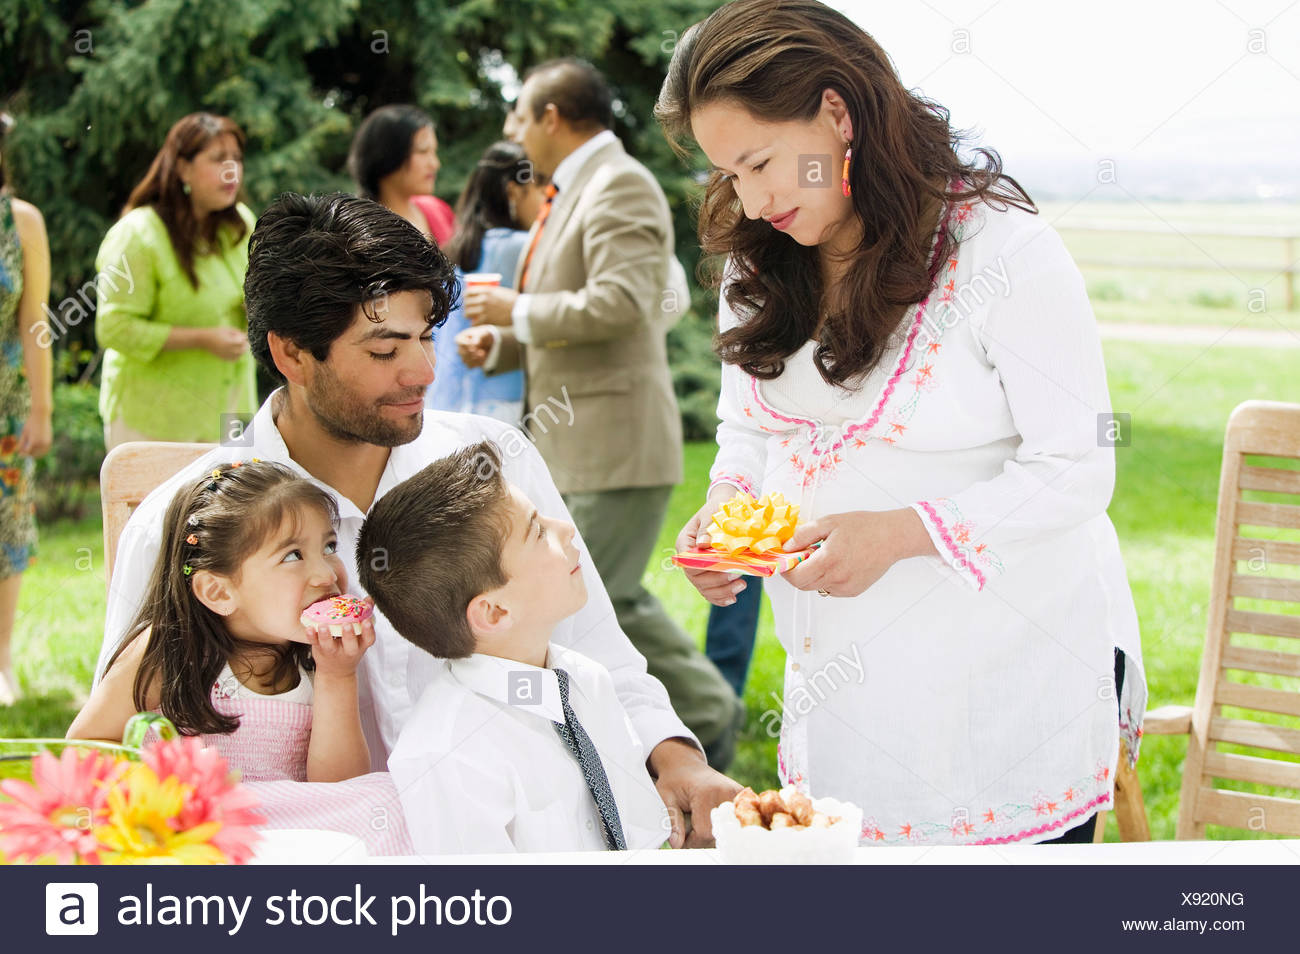 Hispanic Mother Handing Birthday Gift To Son